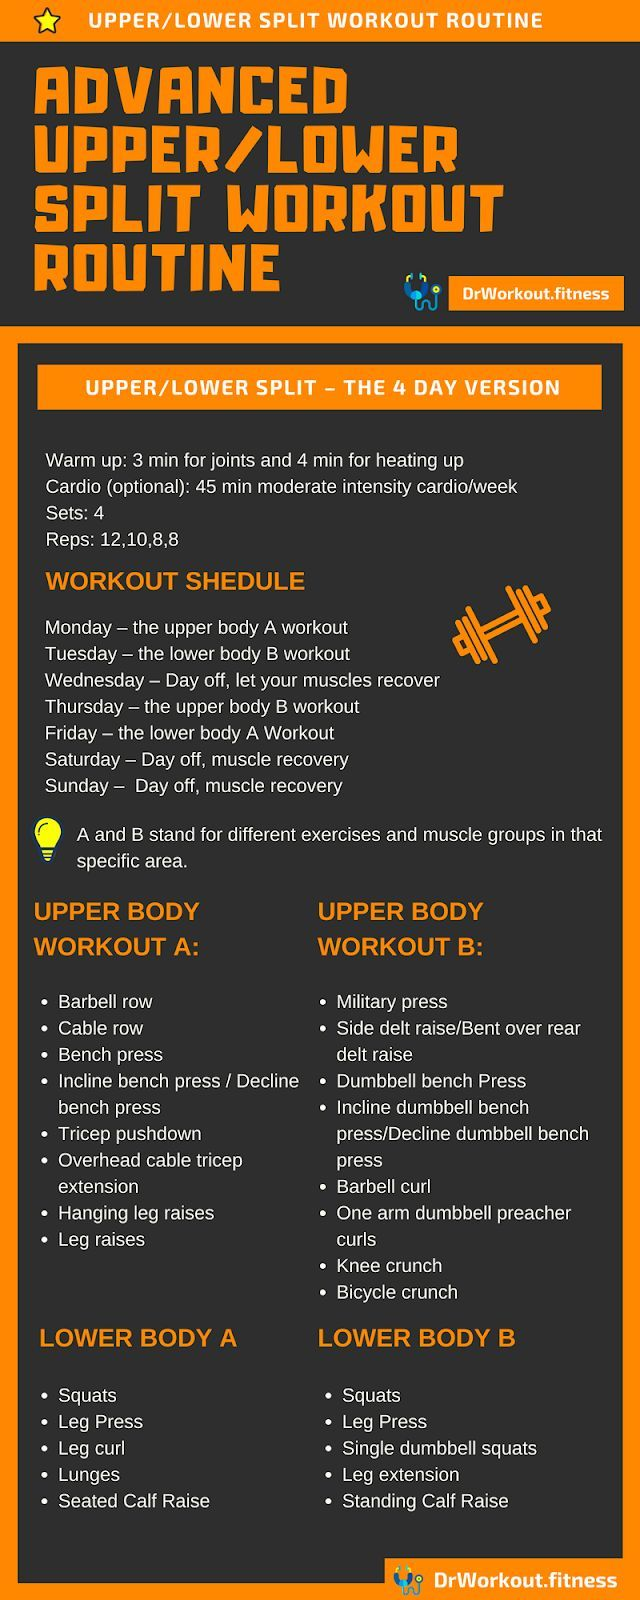 Advanced Upper Lower Split 4 Day Full Body Workout Routine Workout Bodybuilding Gym Fi Fitness Body Upper Body Workout For Women Full Body Workout Plan